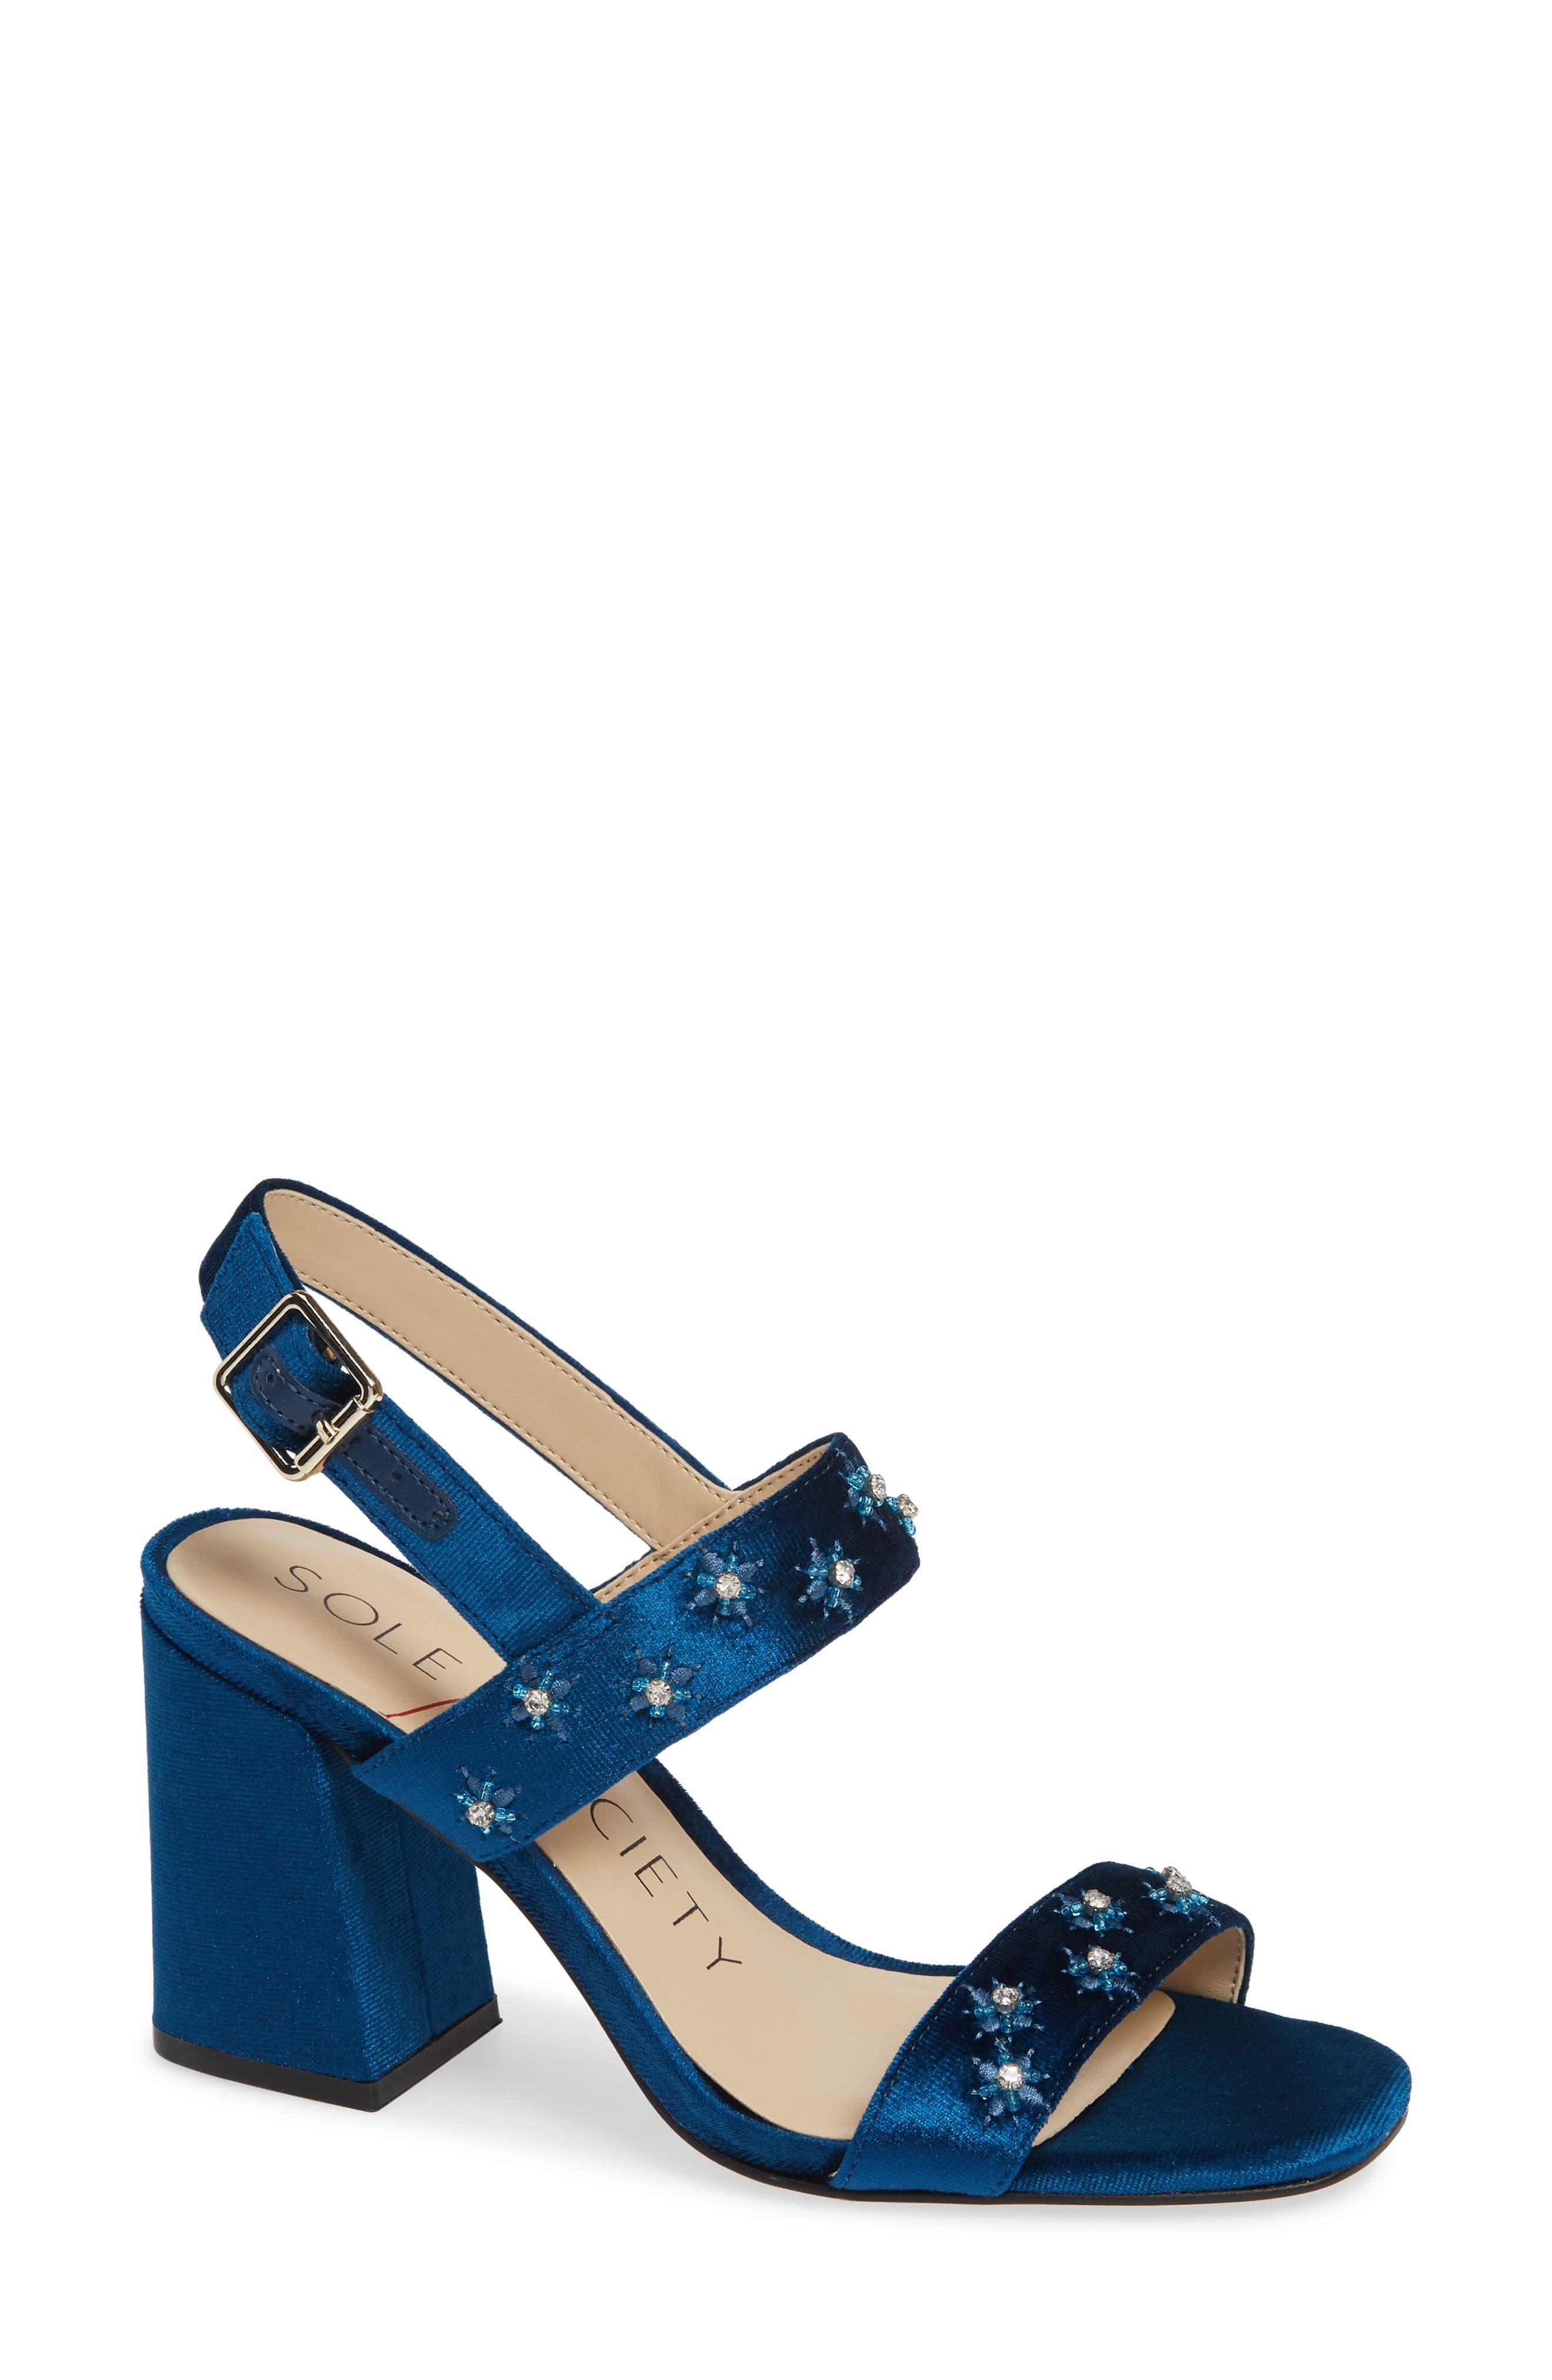 SOLE SOCIETY, Jessibel Sandal, Main thumbnail 1, color, CERULEAN BLUE VELVET